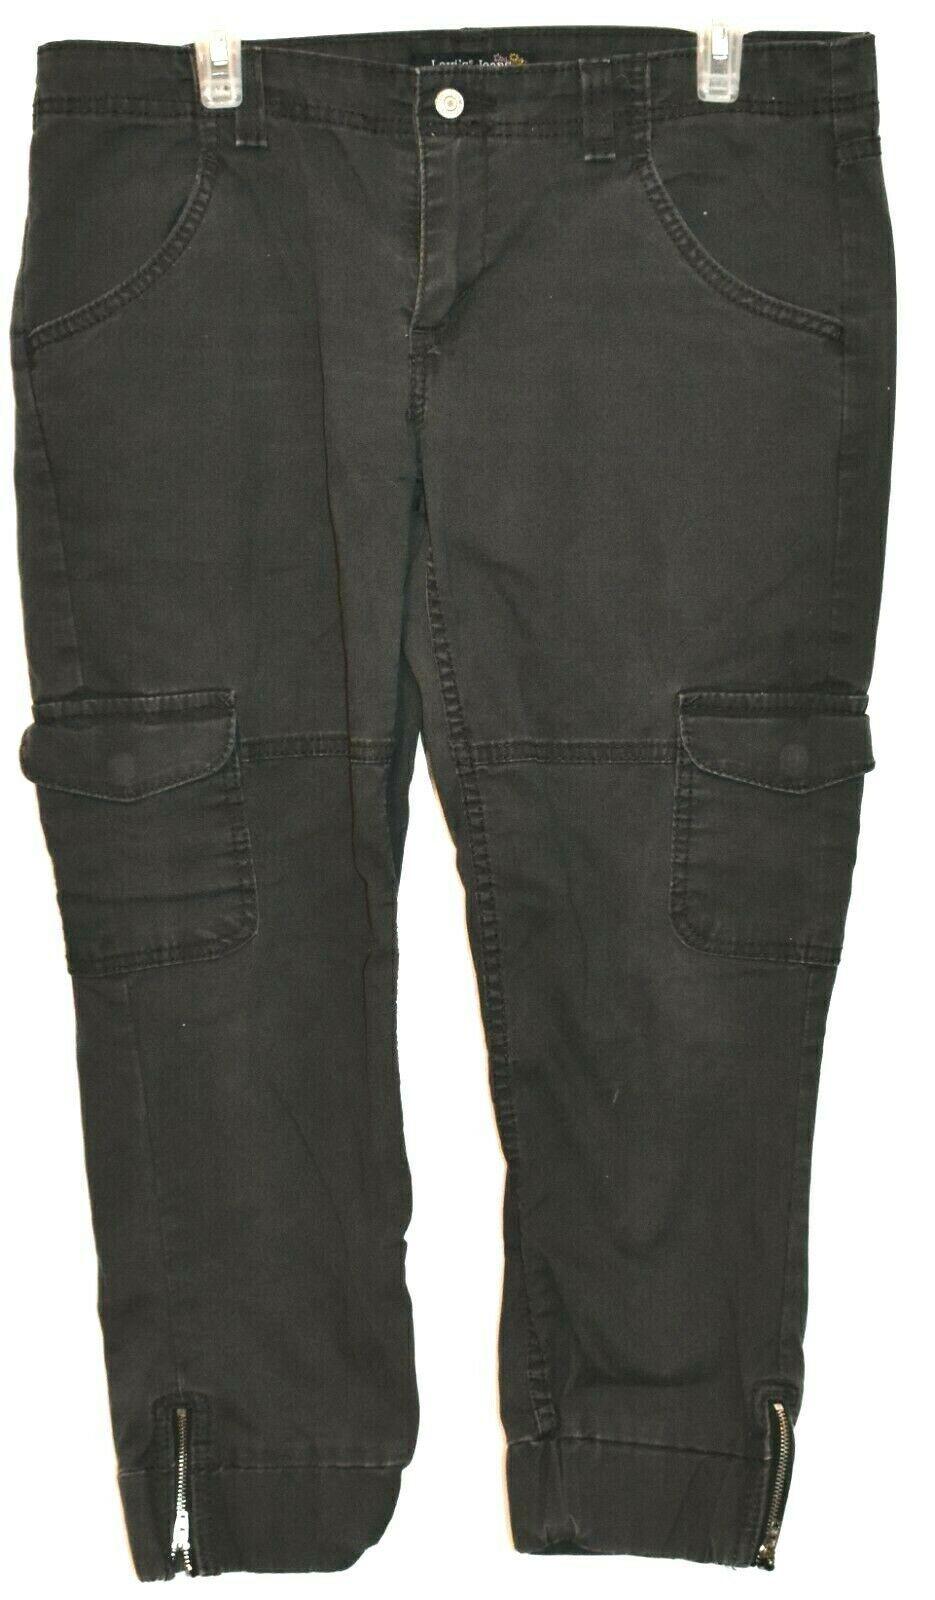 Levi's Women's Gray Cargo Cropped Capri Zipper Leg Denim Pants Size 13